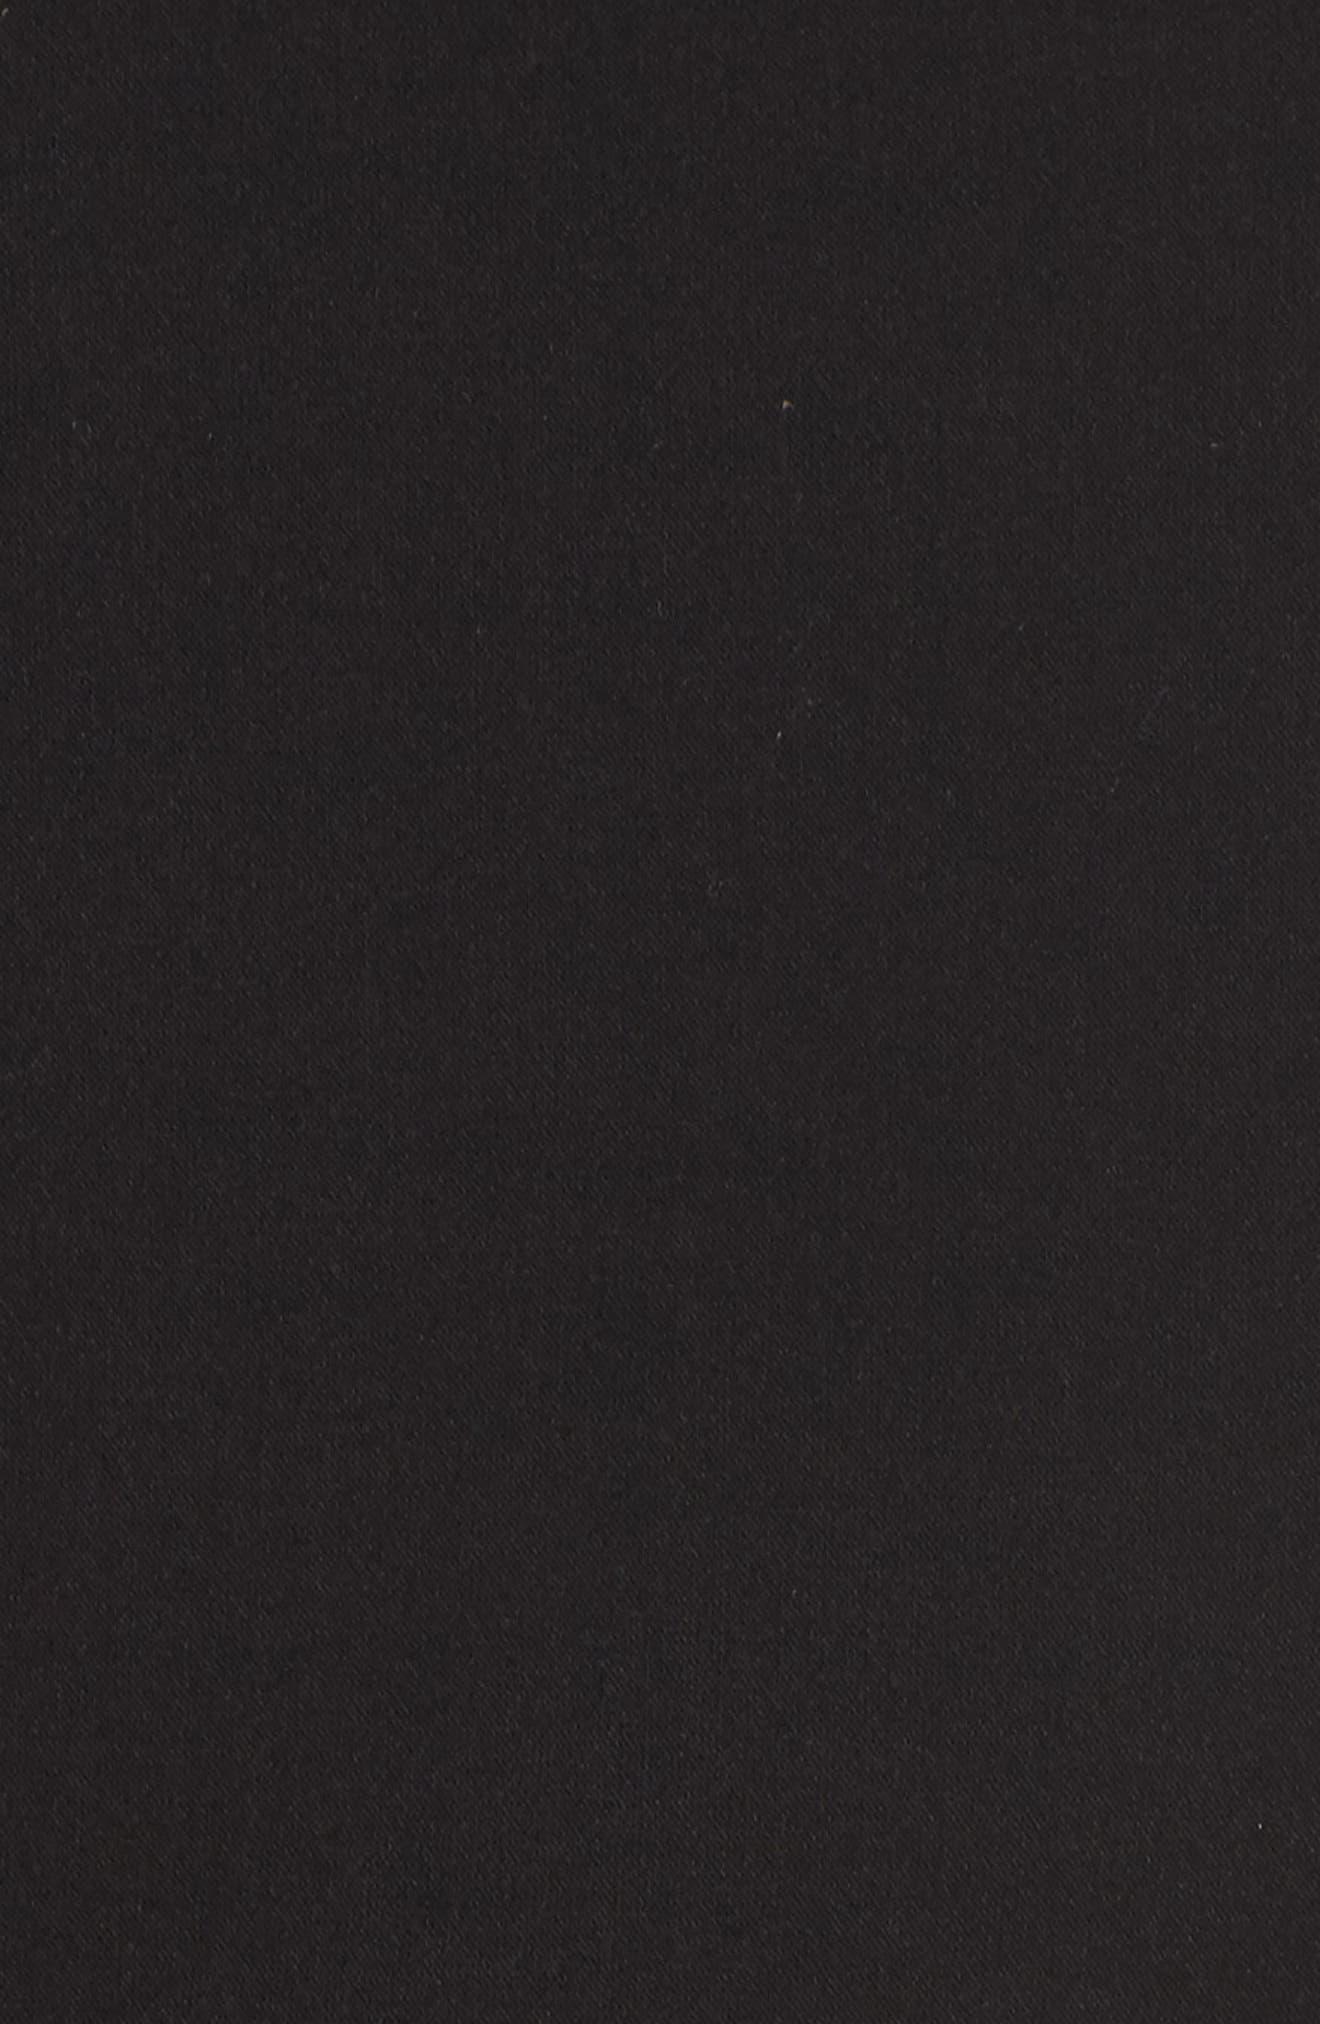 Whisper Light Sheath Dress,                             Alternate thumbnail 6, color,                             BLACK